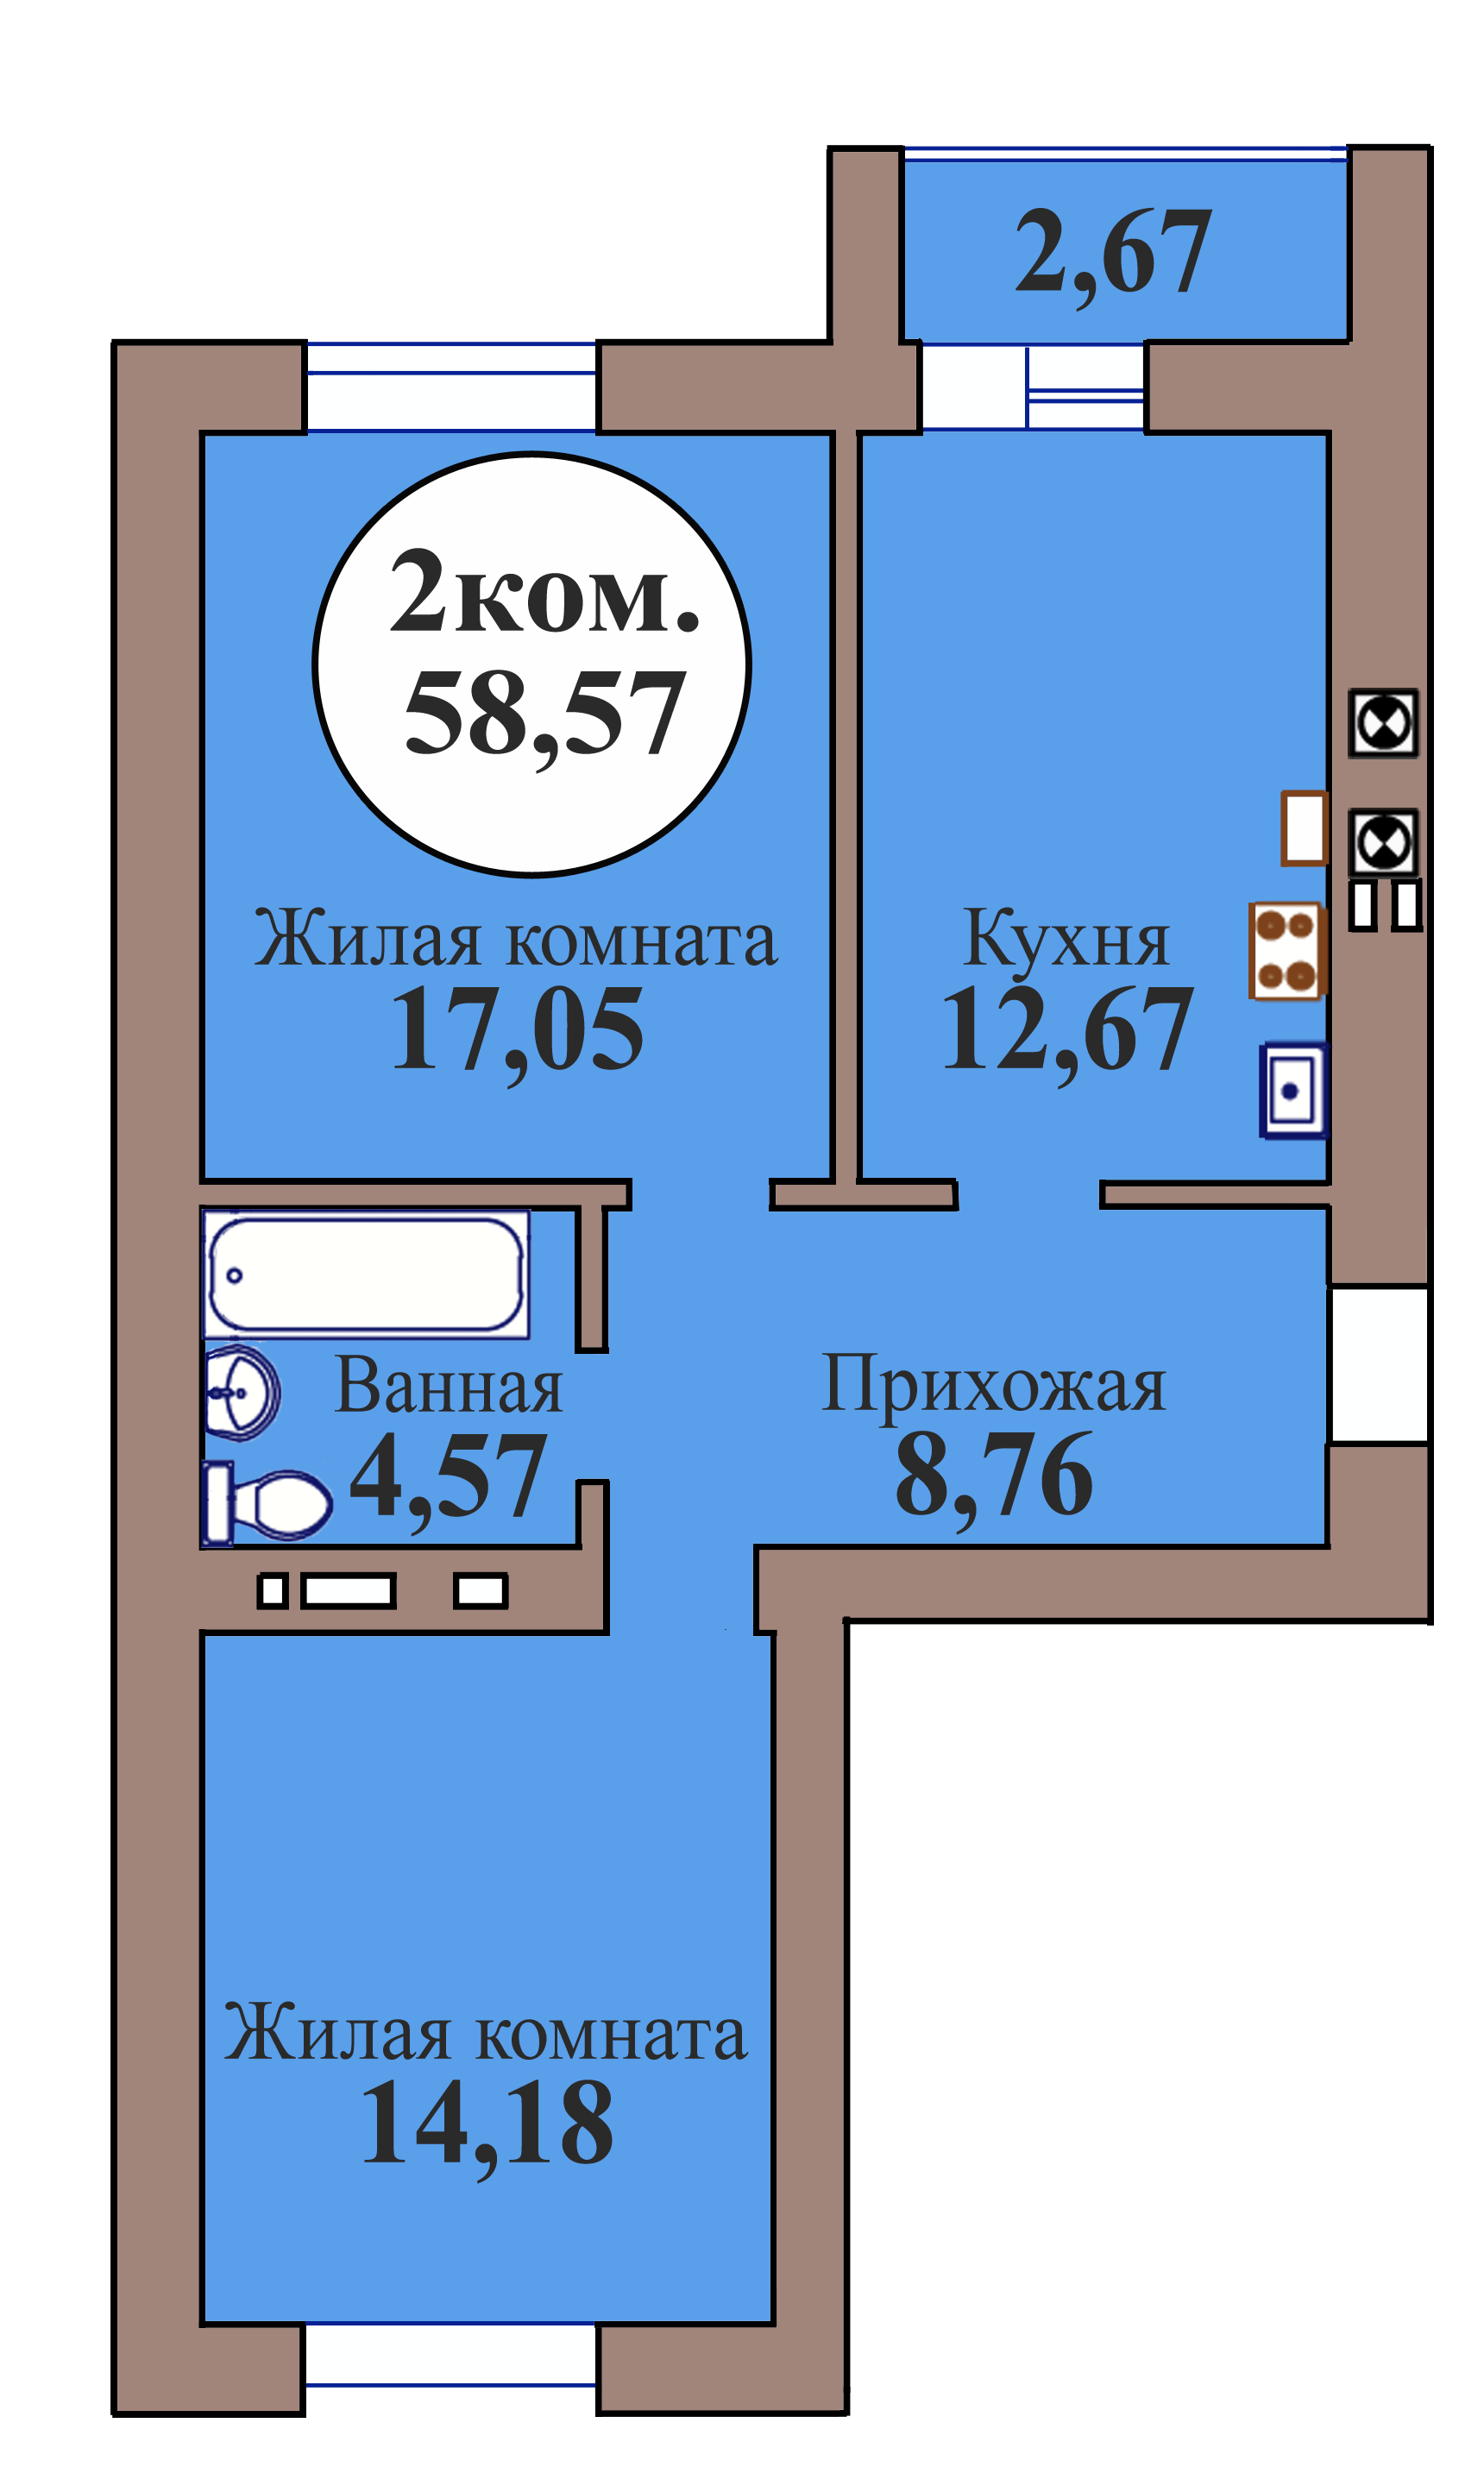 2-комн. кв. по пер. Калининградский, 5 кв. 121 в Калининграде